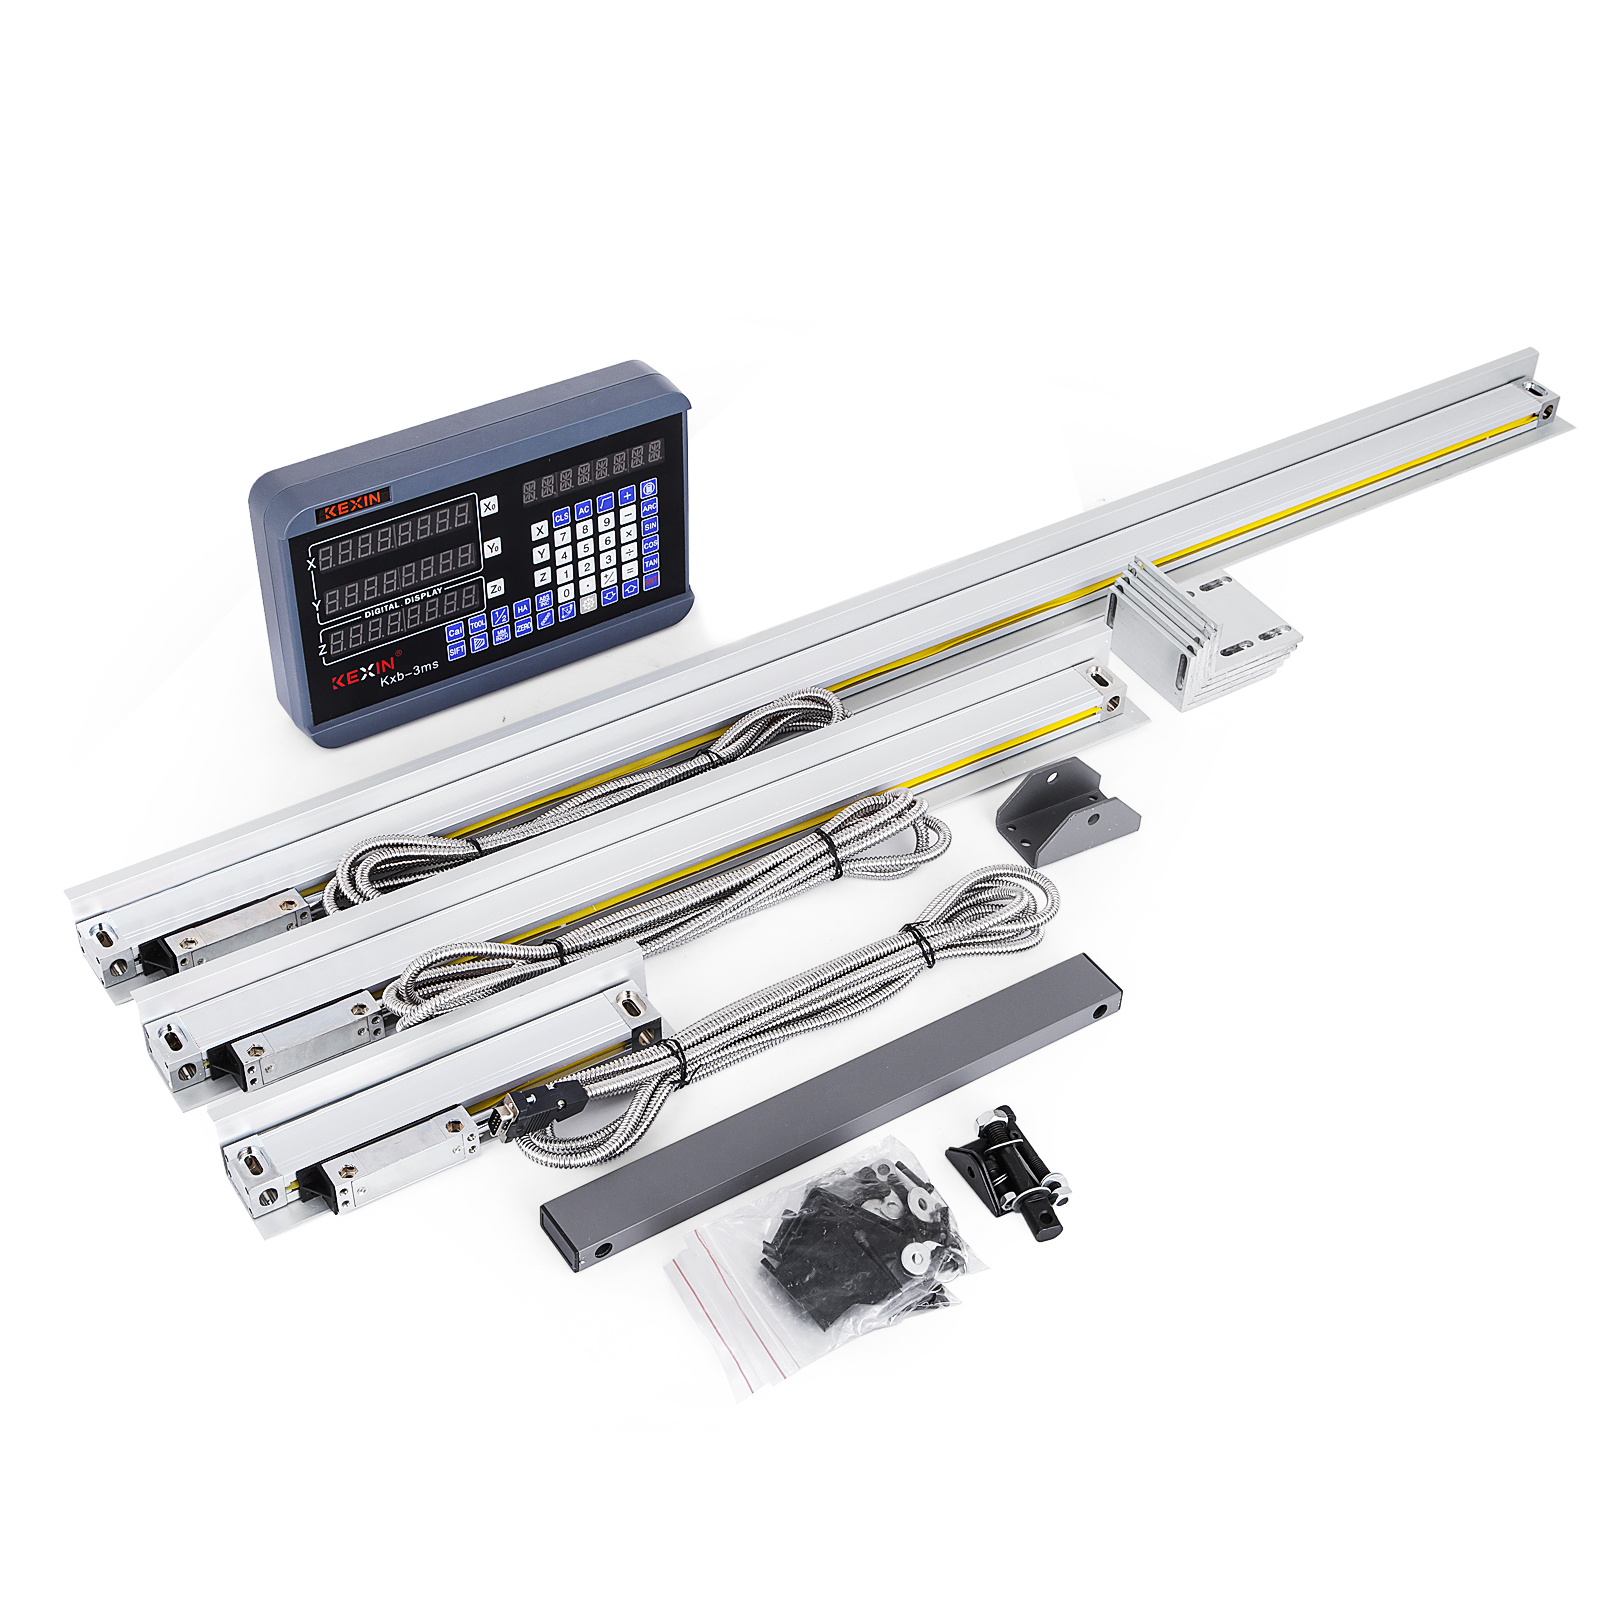 3 Axis 450-500-1000 Digital Readout Display DRO Display Milling Grinding GREAT